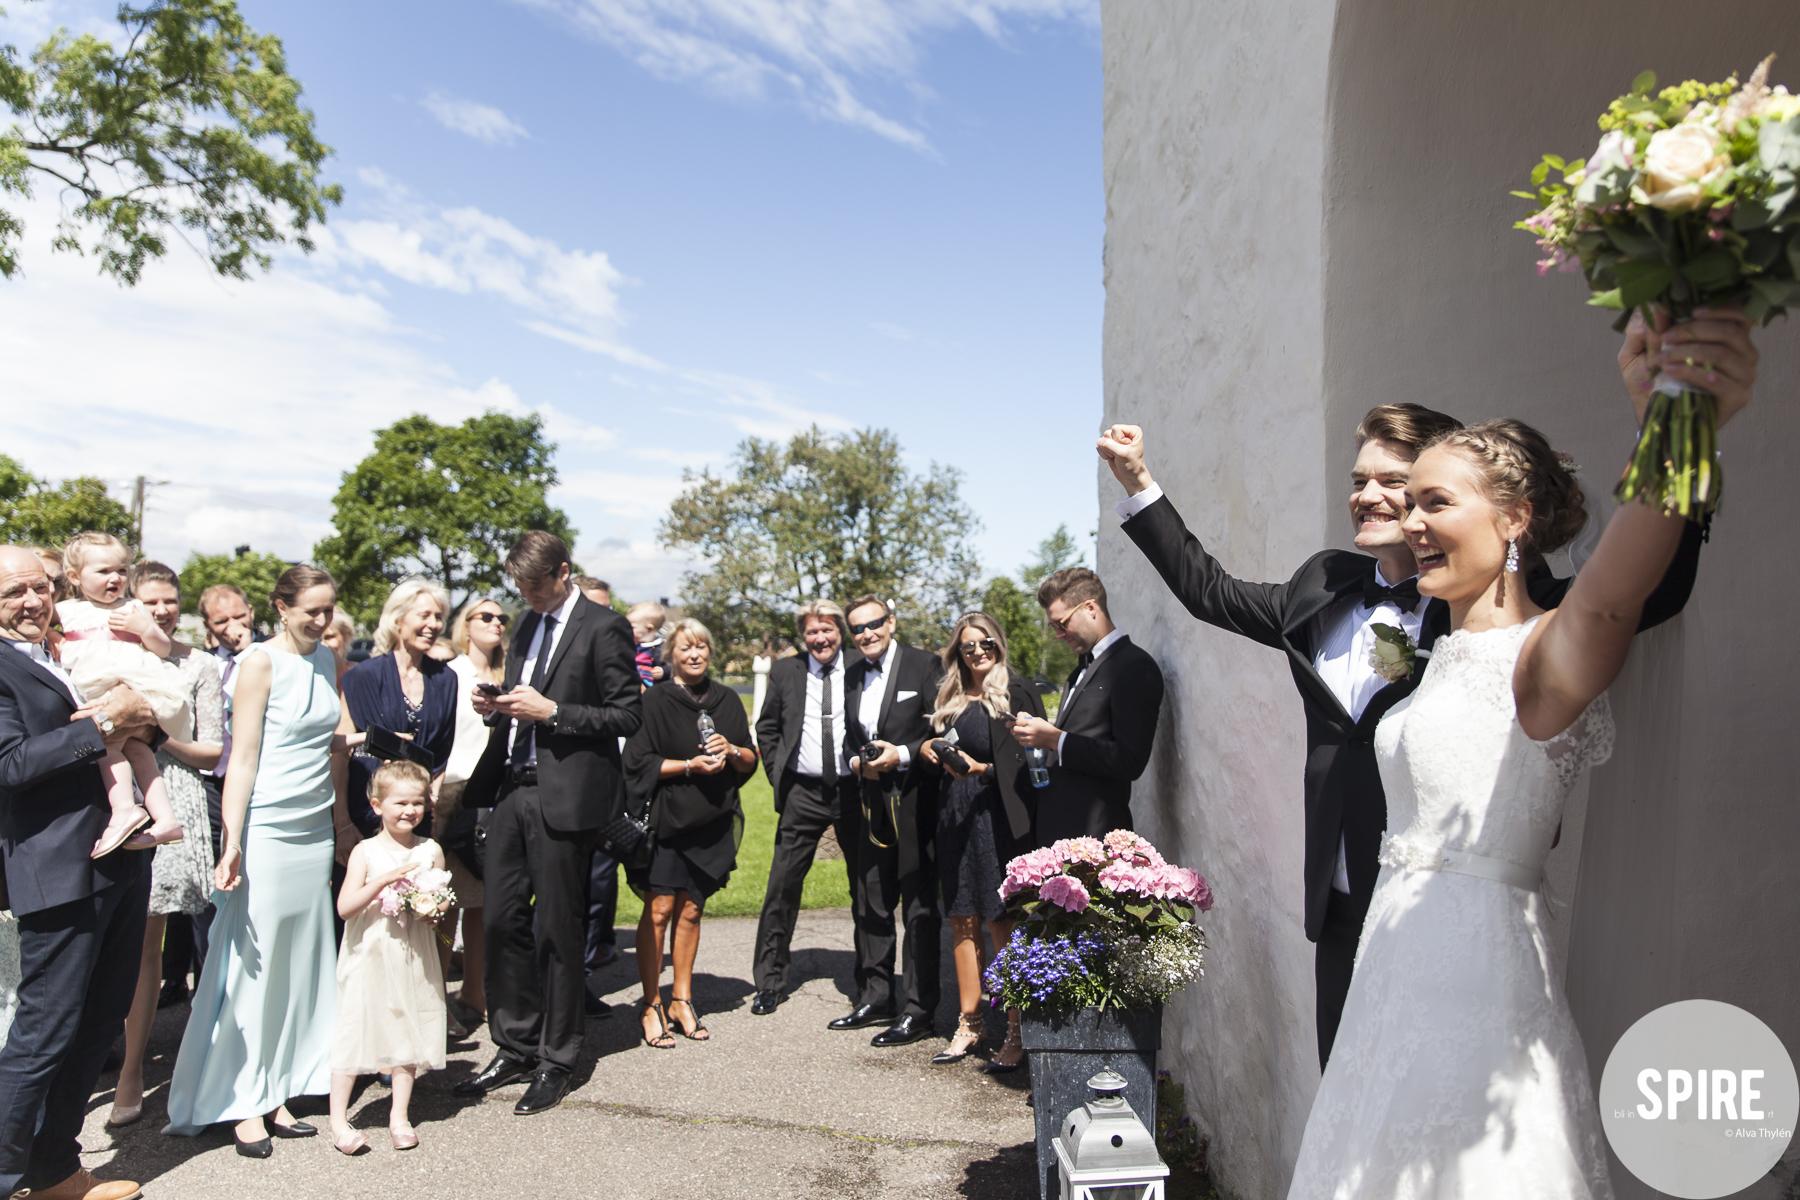 Bryllup - etter sermoni